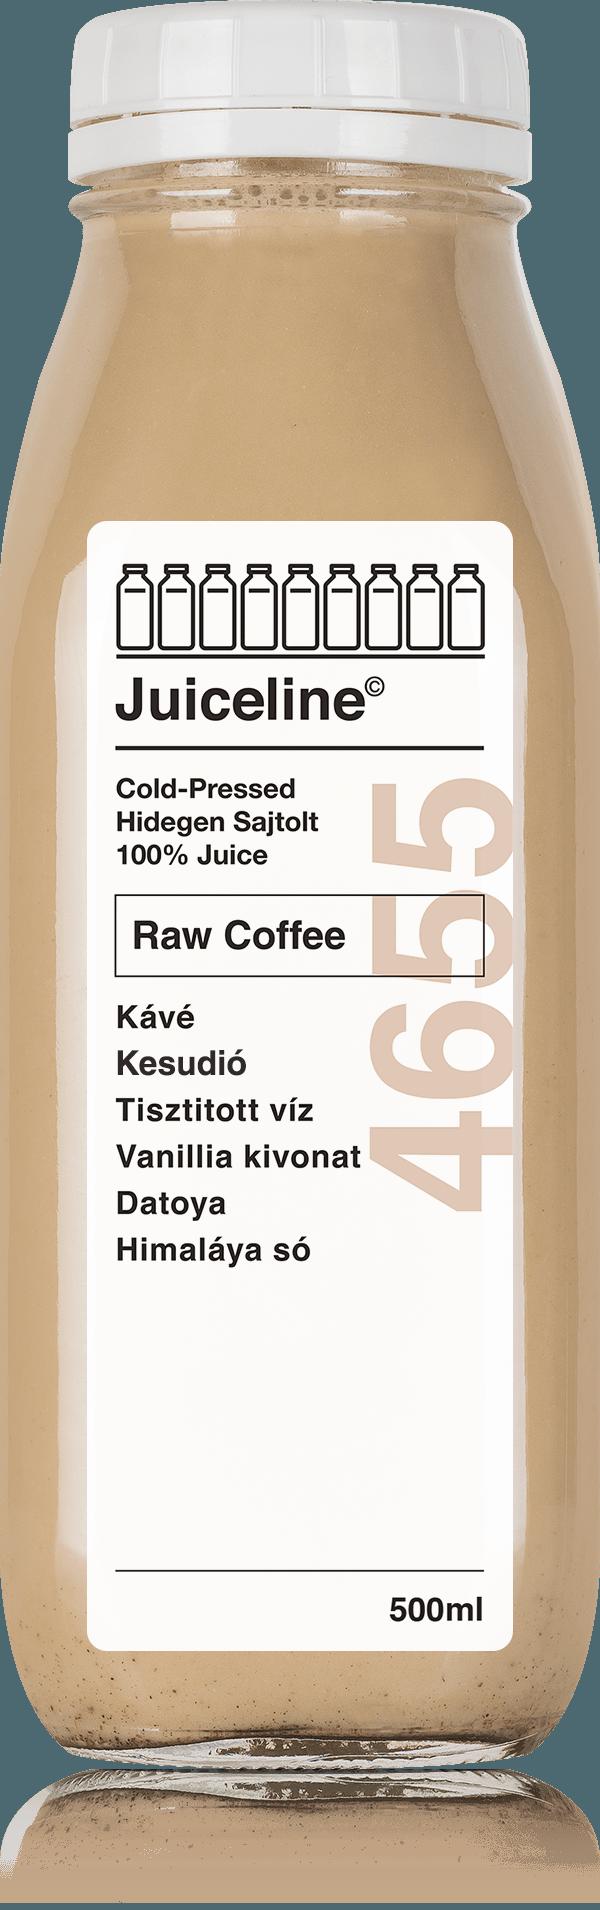 4655 Raw Coffee